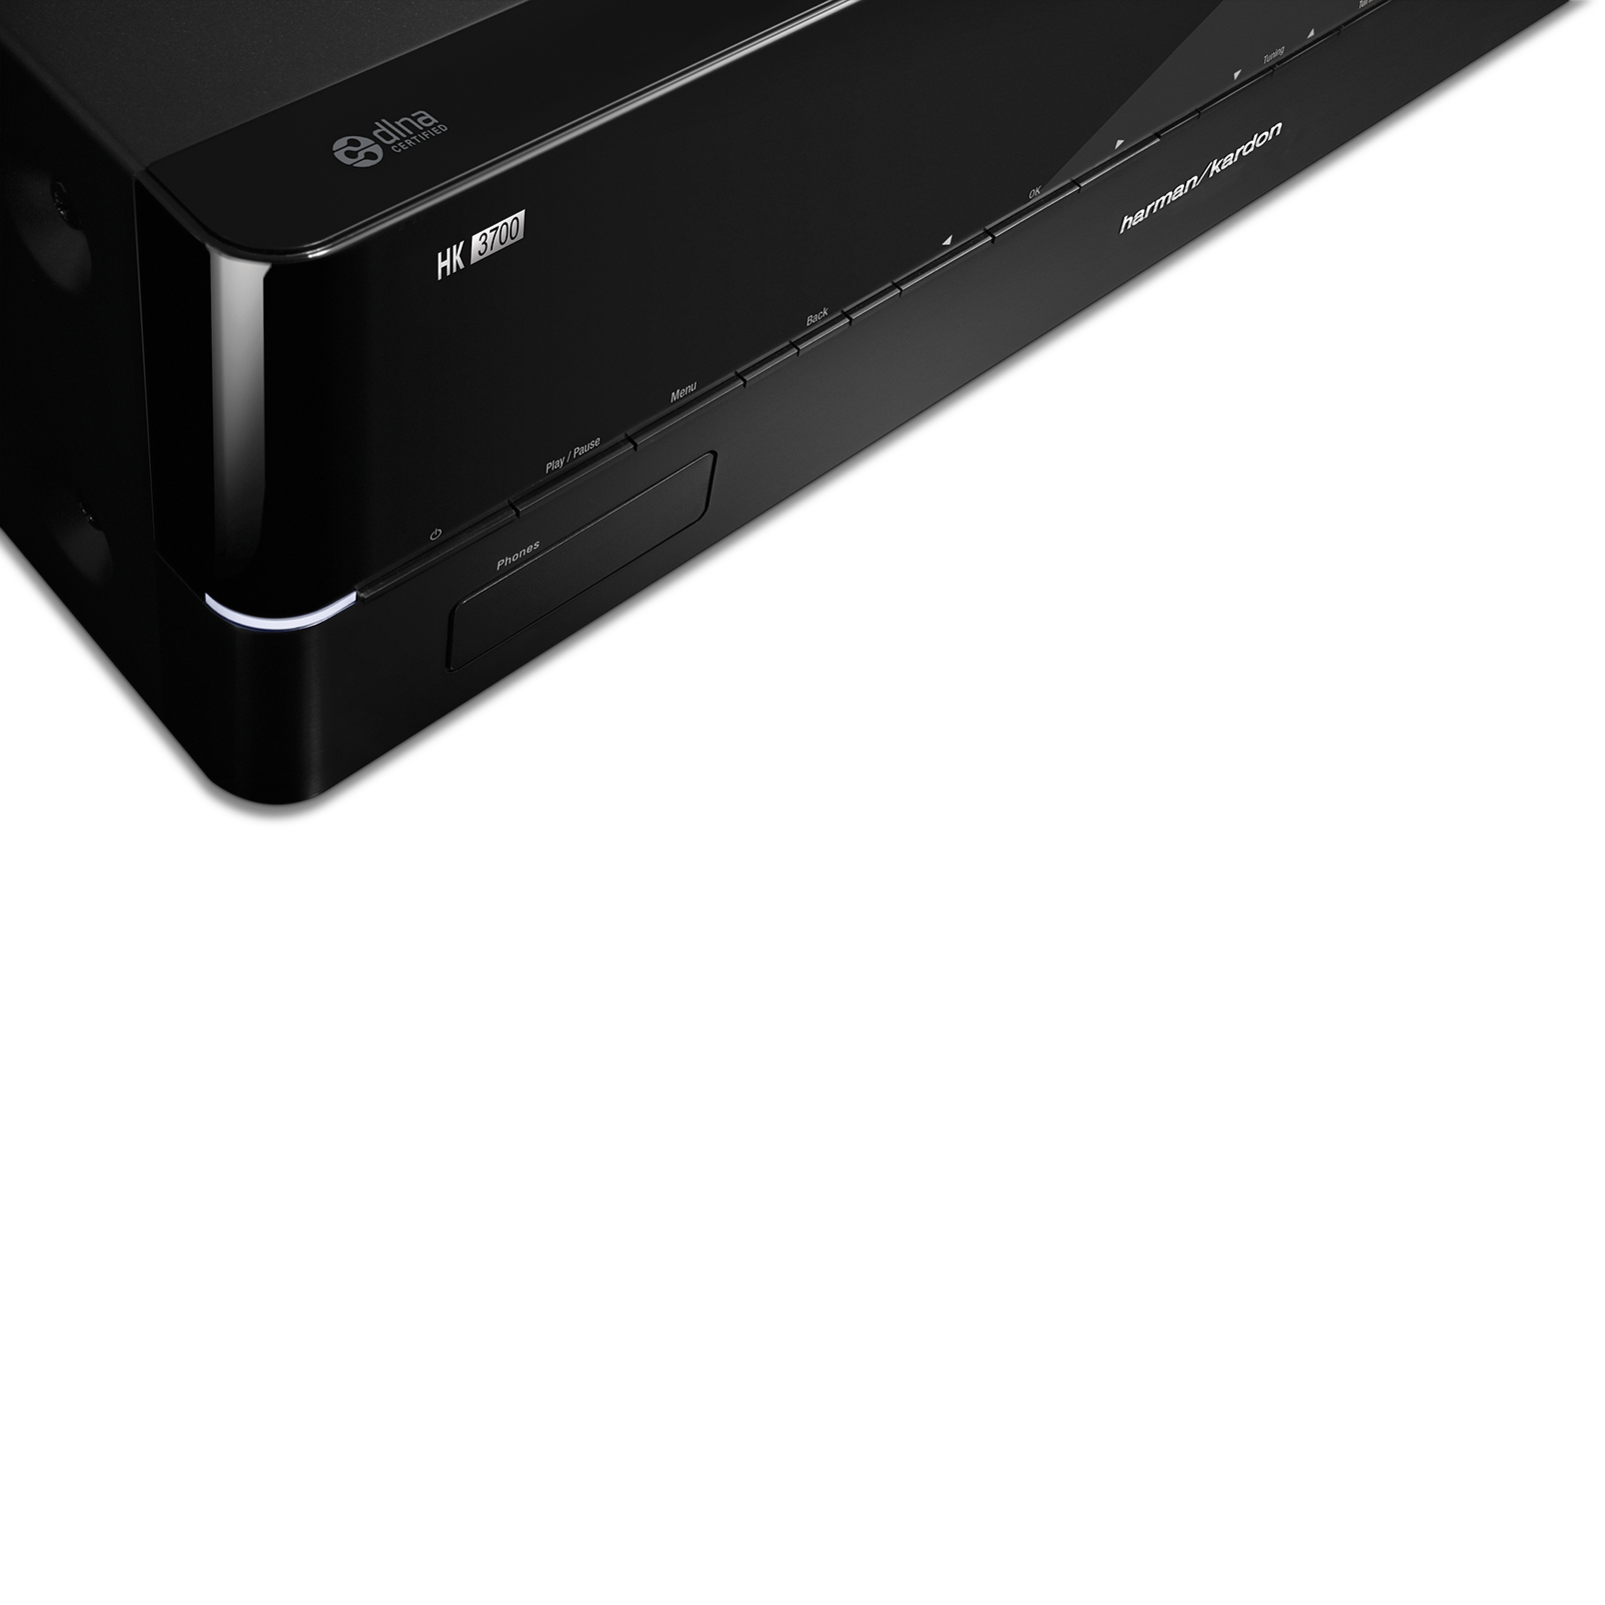 HK 3700 - Black - 170 watt stereo receiver with network connectivity - Detailshot 2